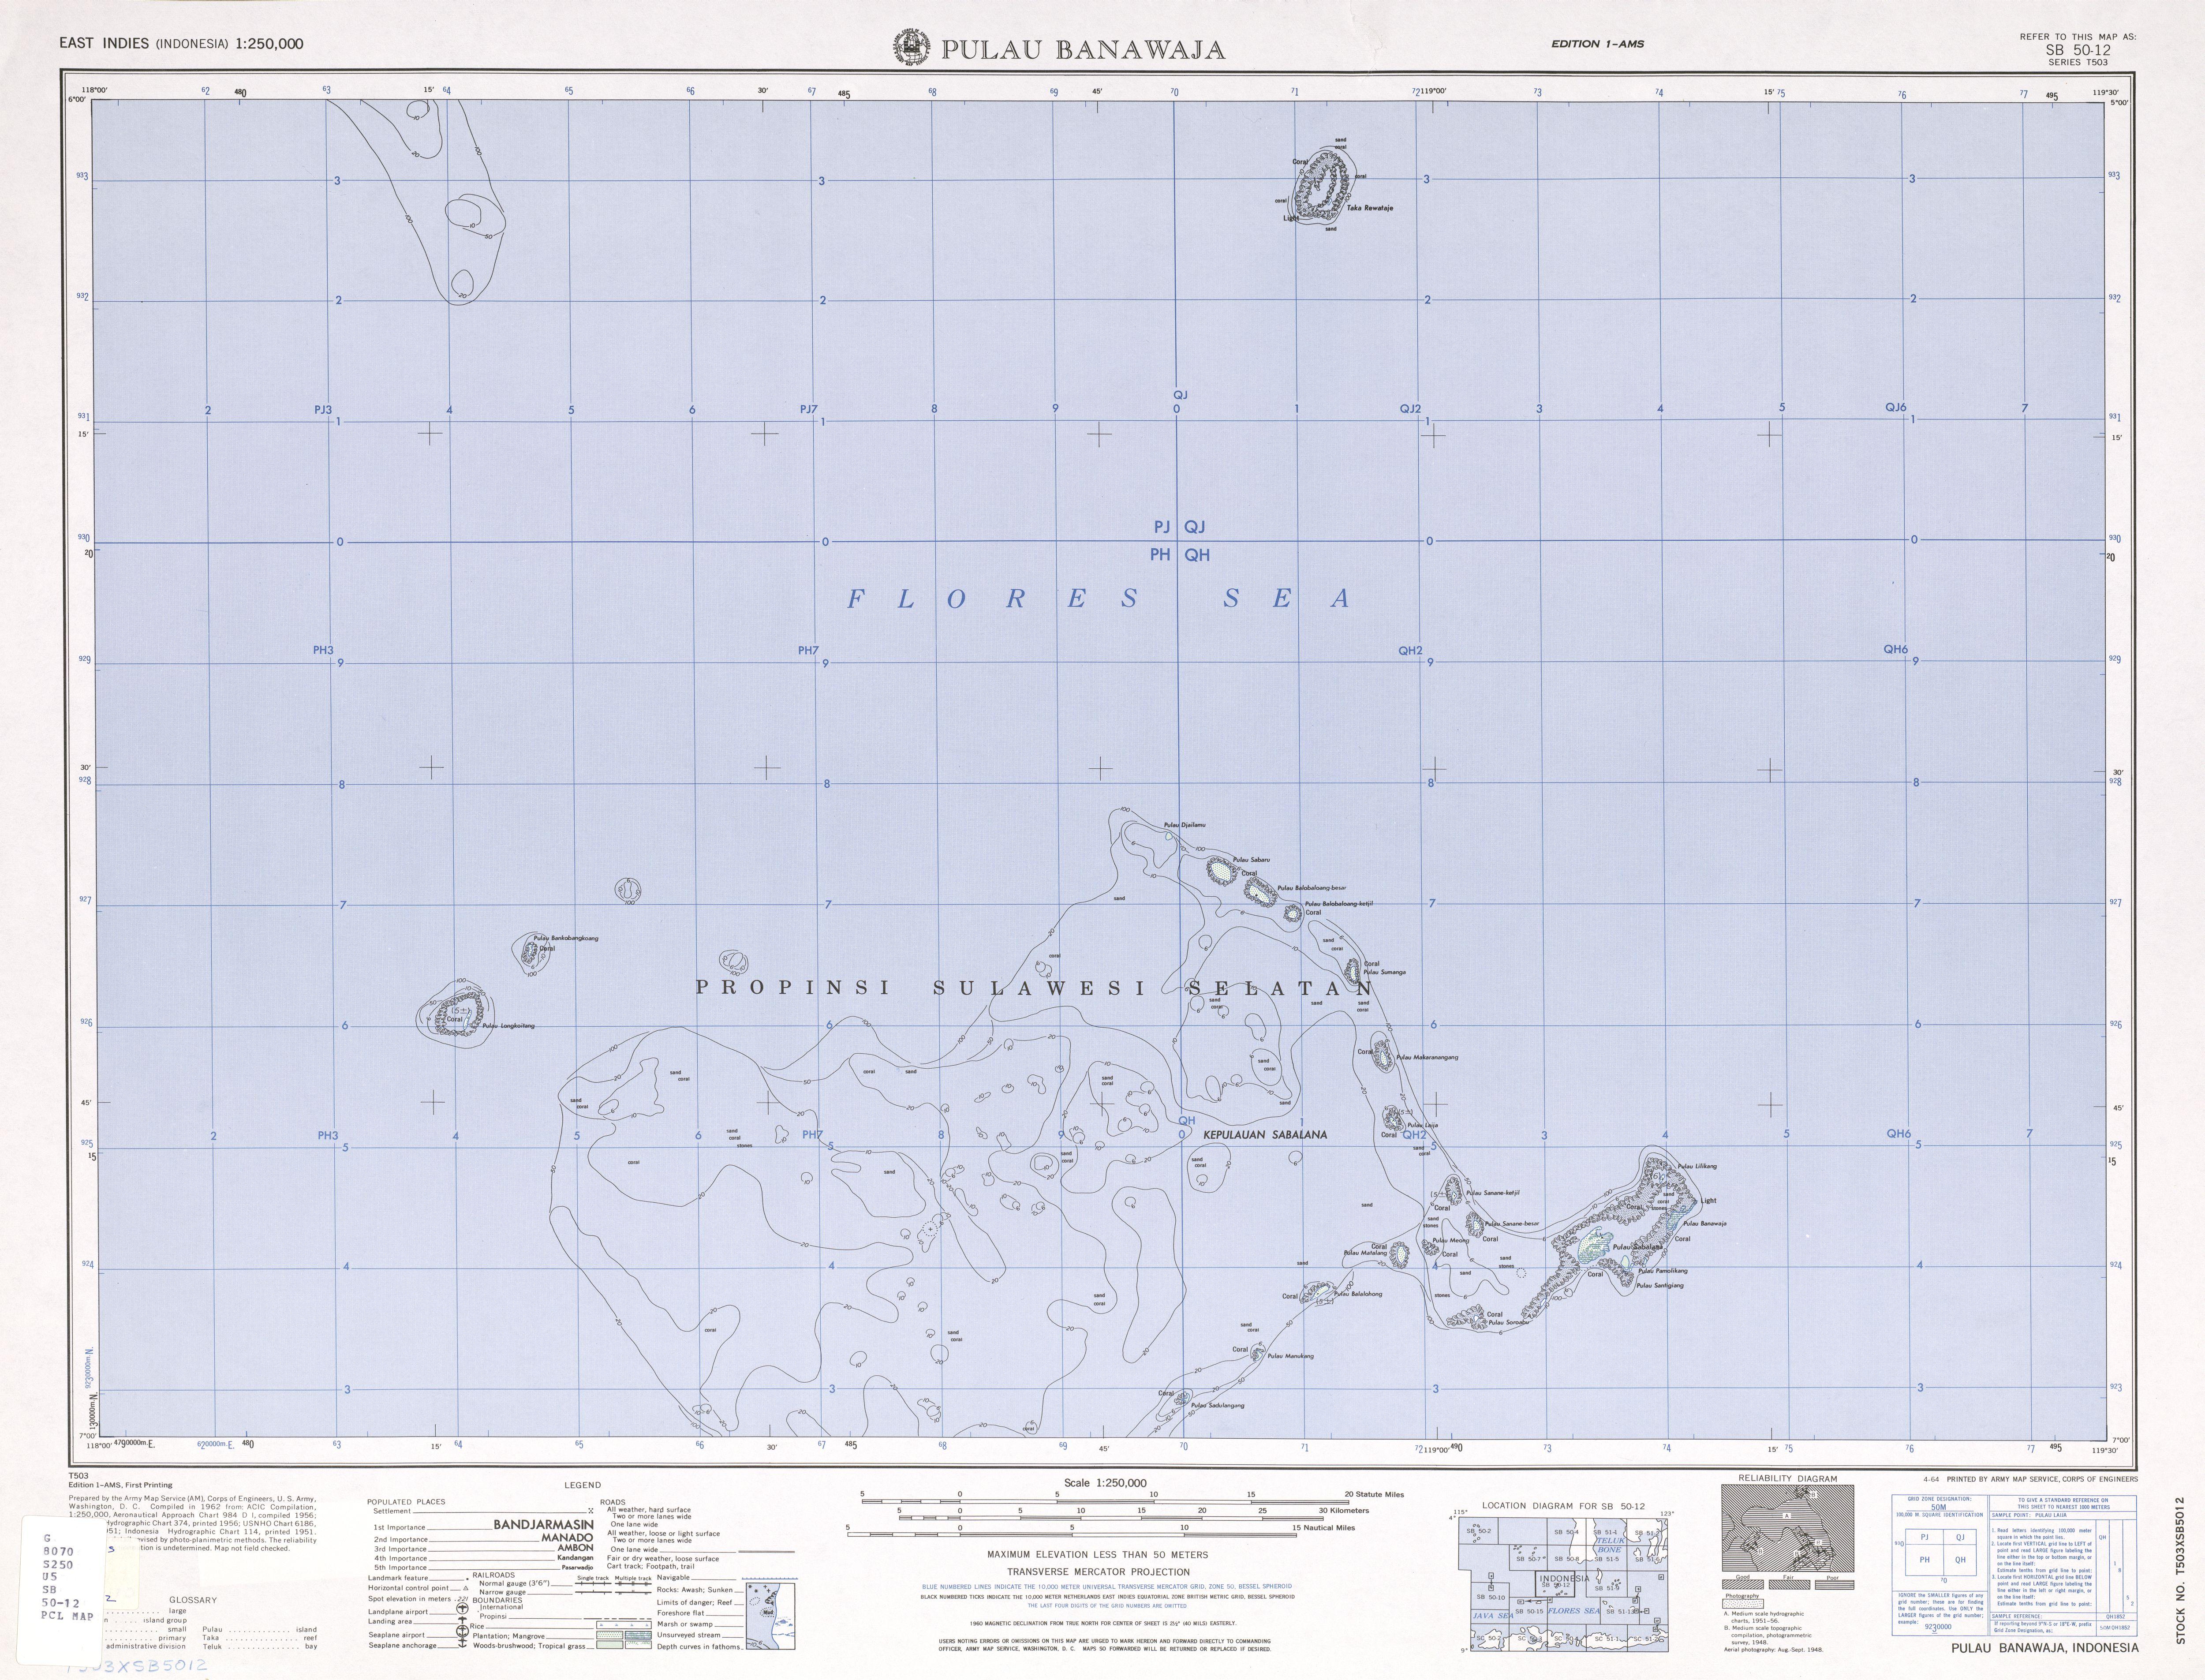 Pulau Banawaja